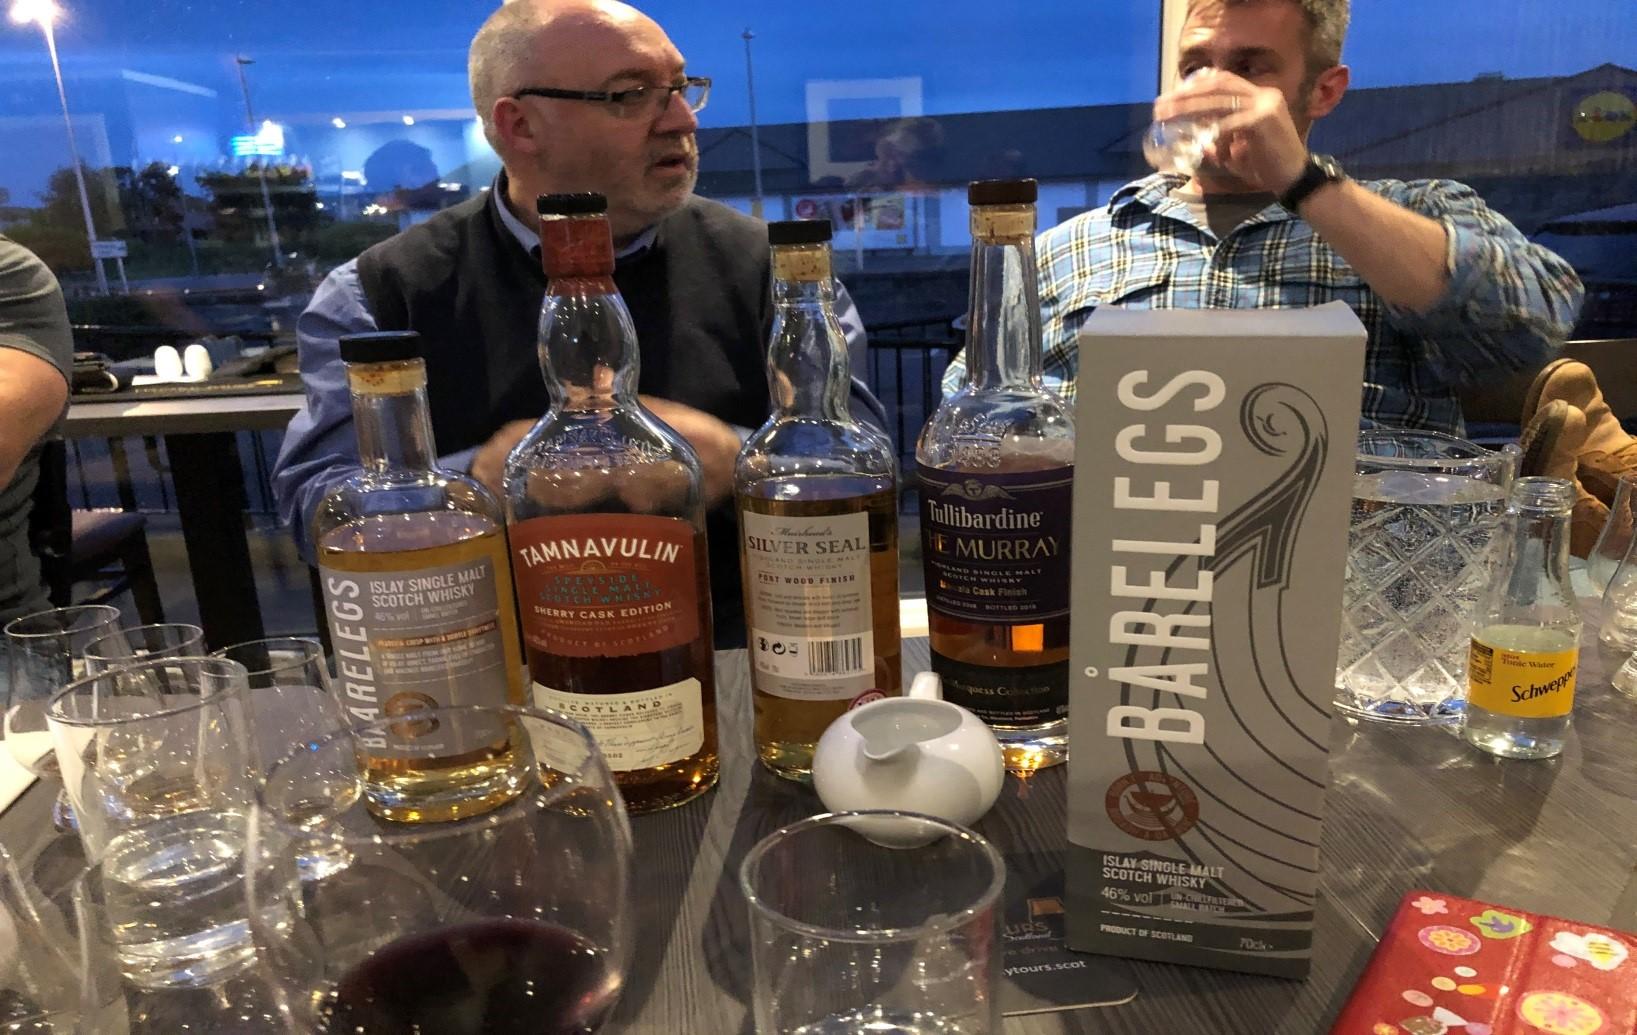 Vikings, Kilts, Helmets & Whisky